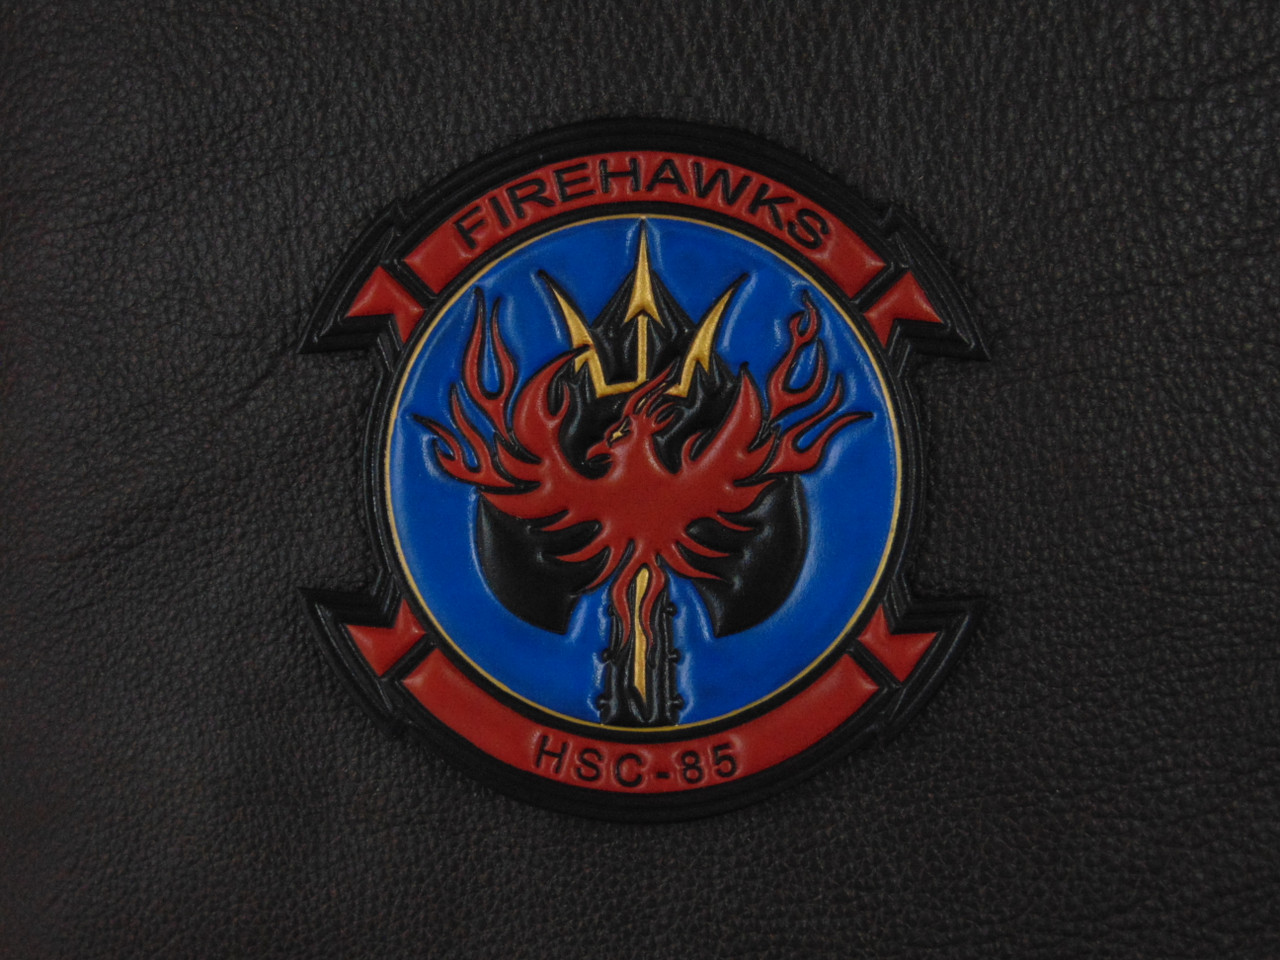 HSC-85 FireHawks Classic Embossed full color